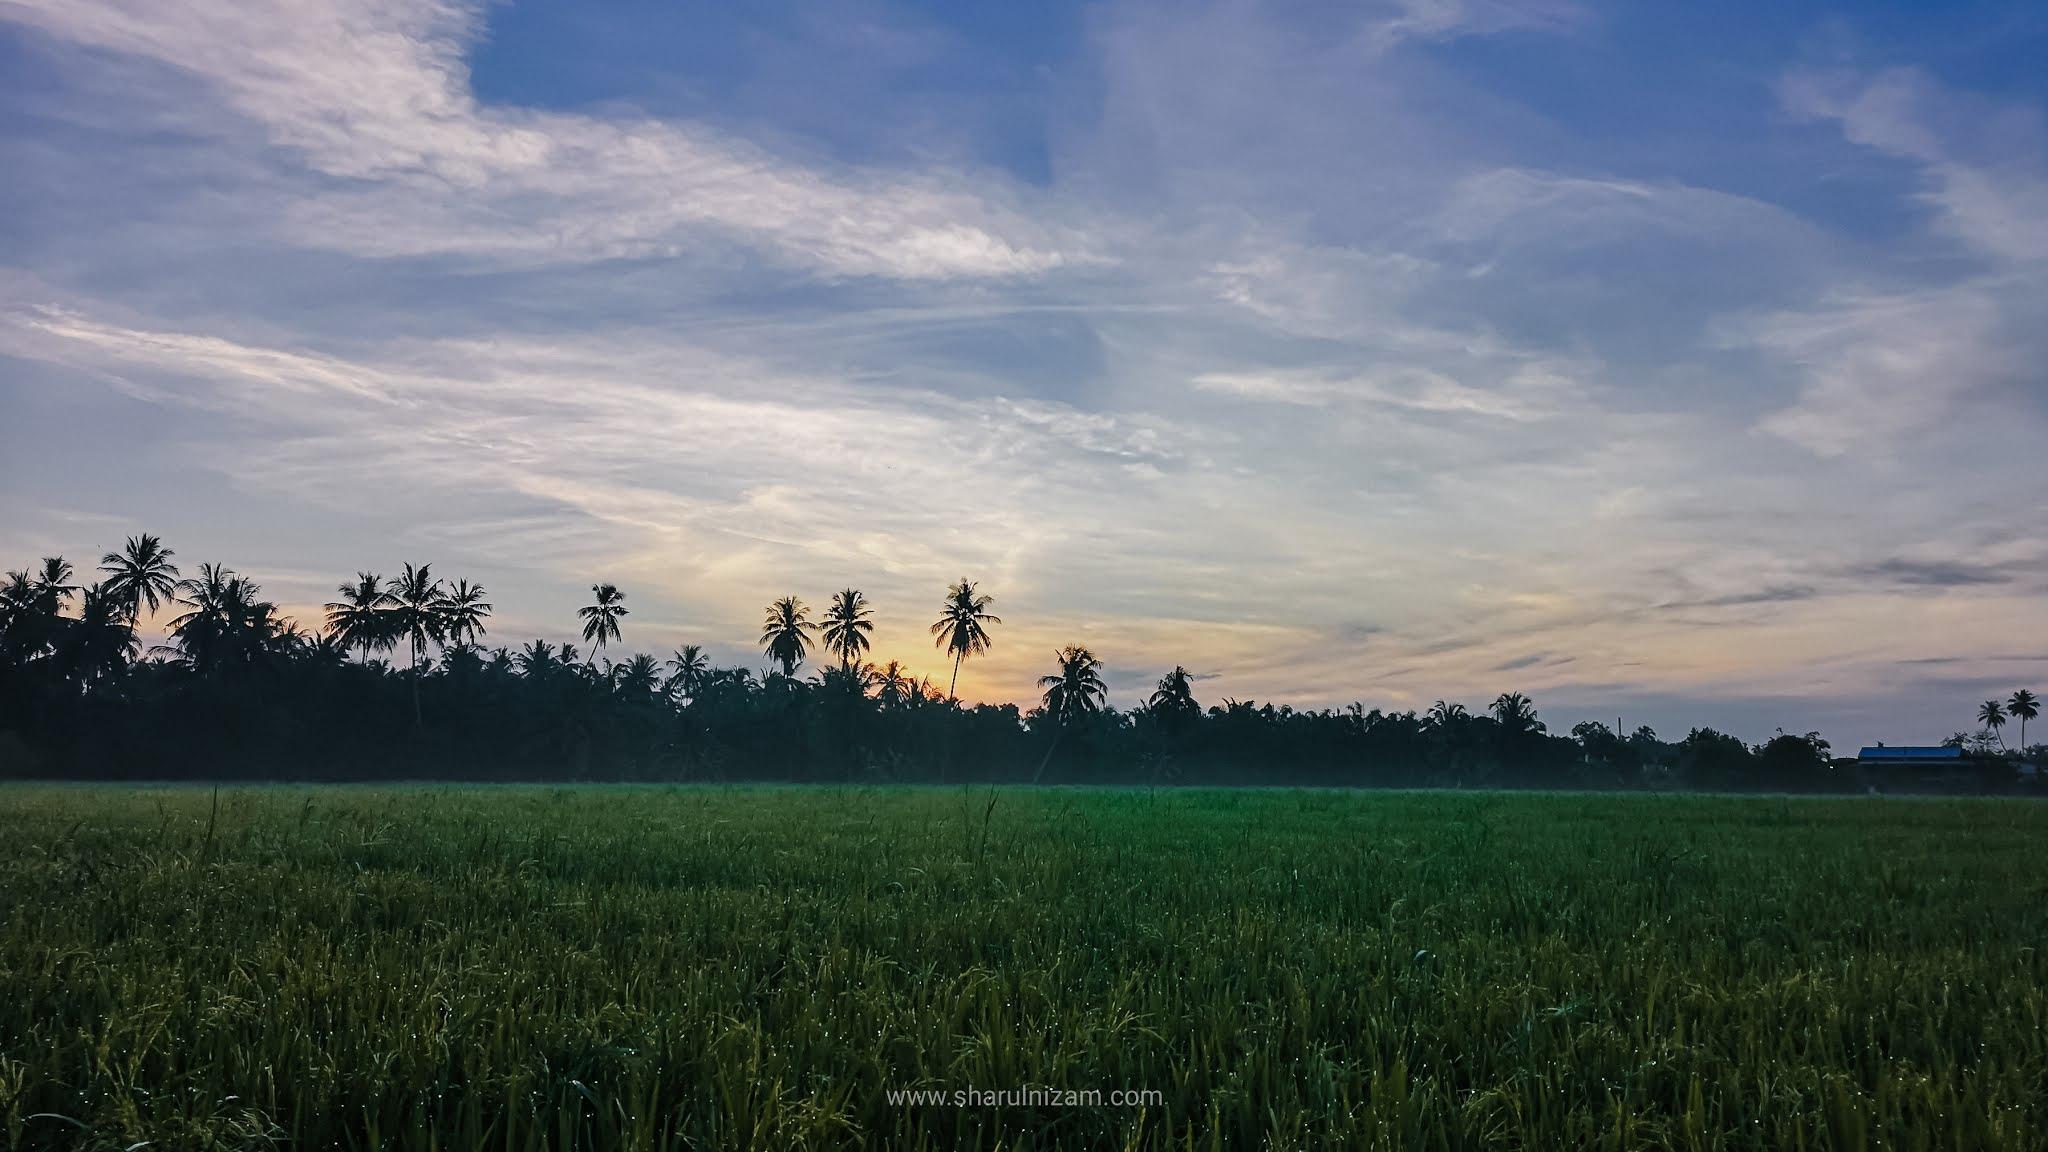 Menikmati Pemandangan Pagi Sawah Padi Di Parit Buntar, Perak